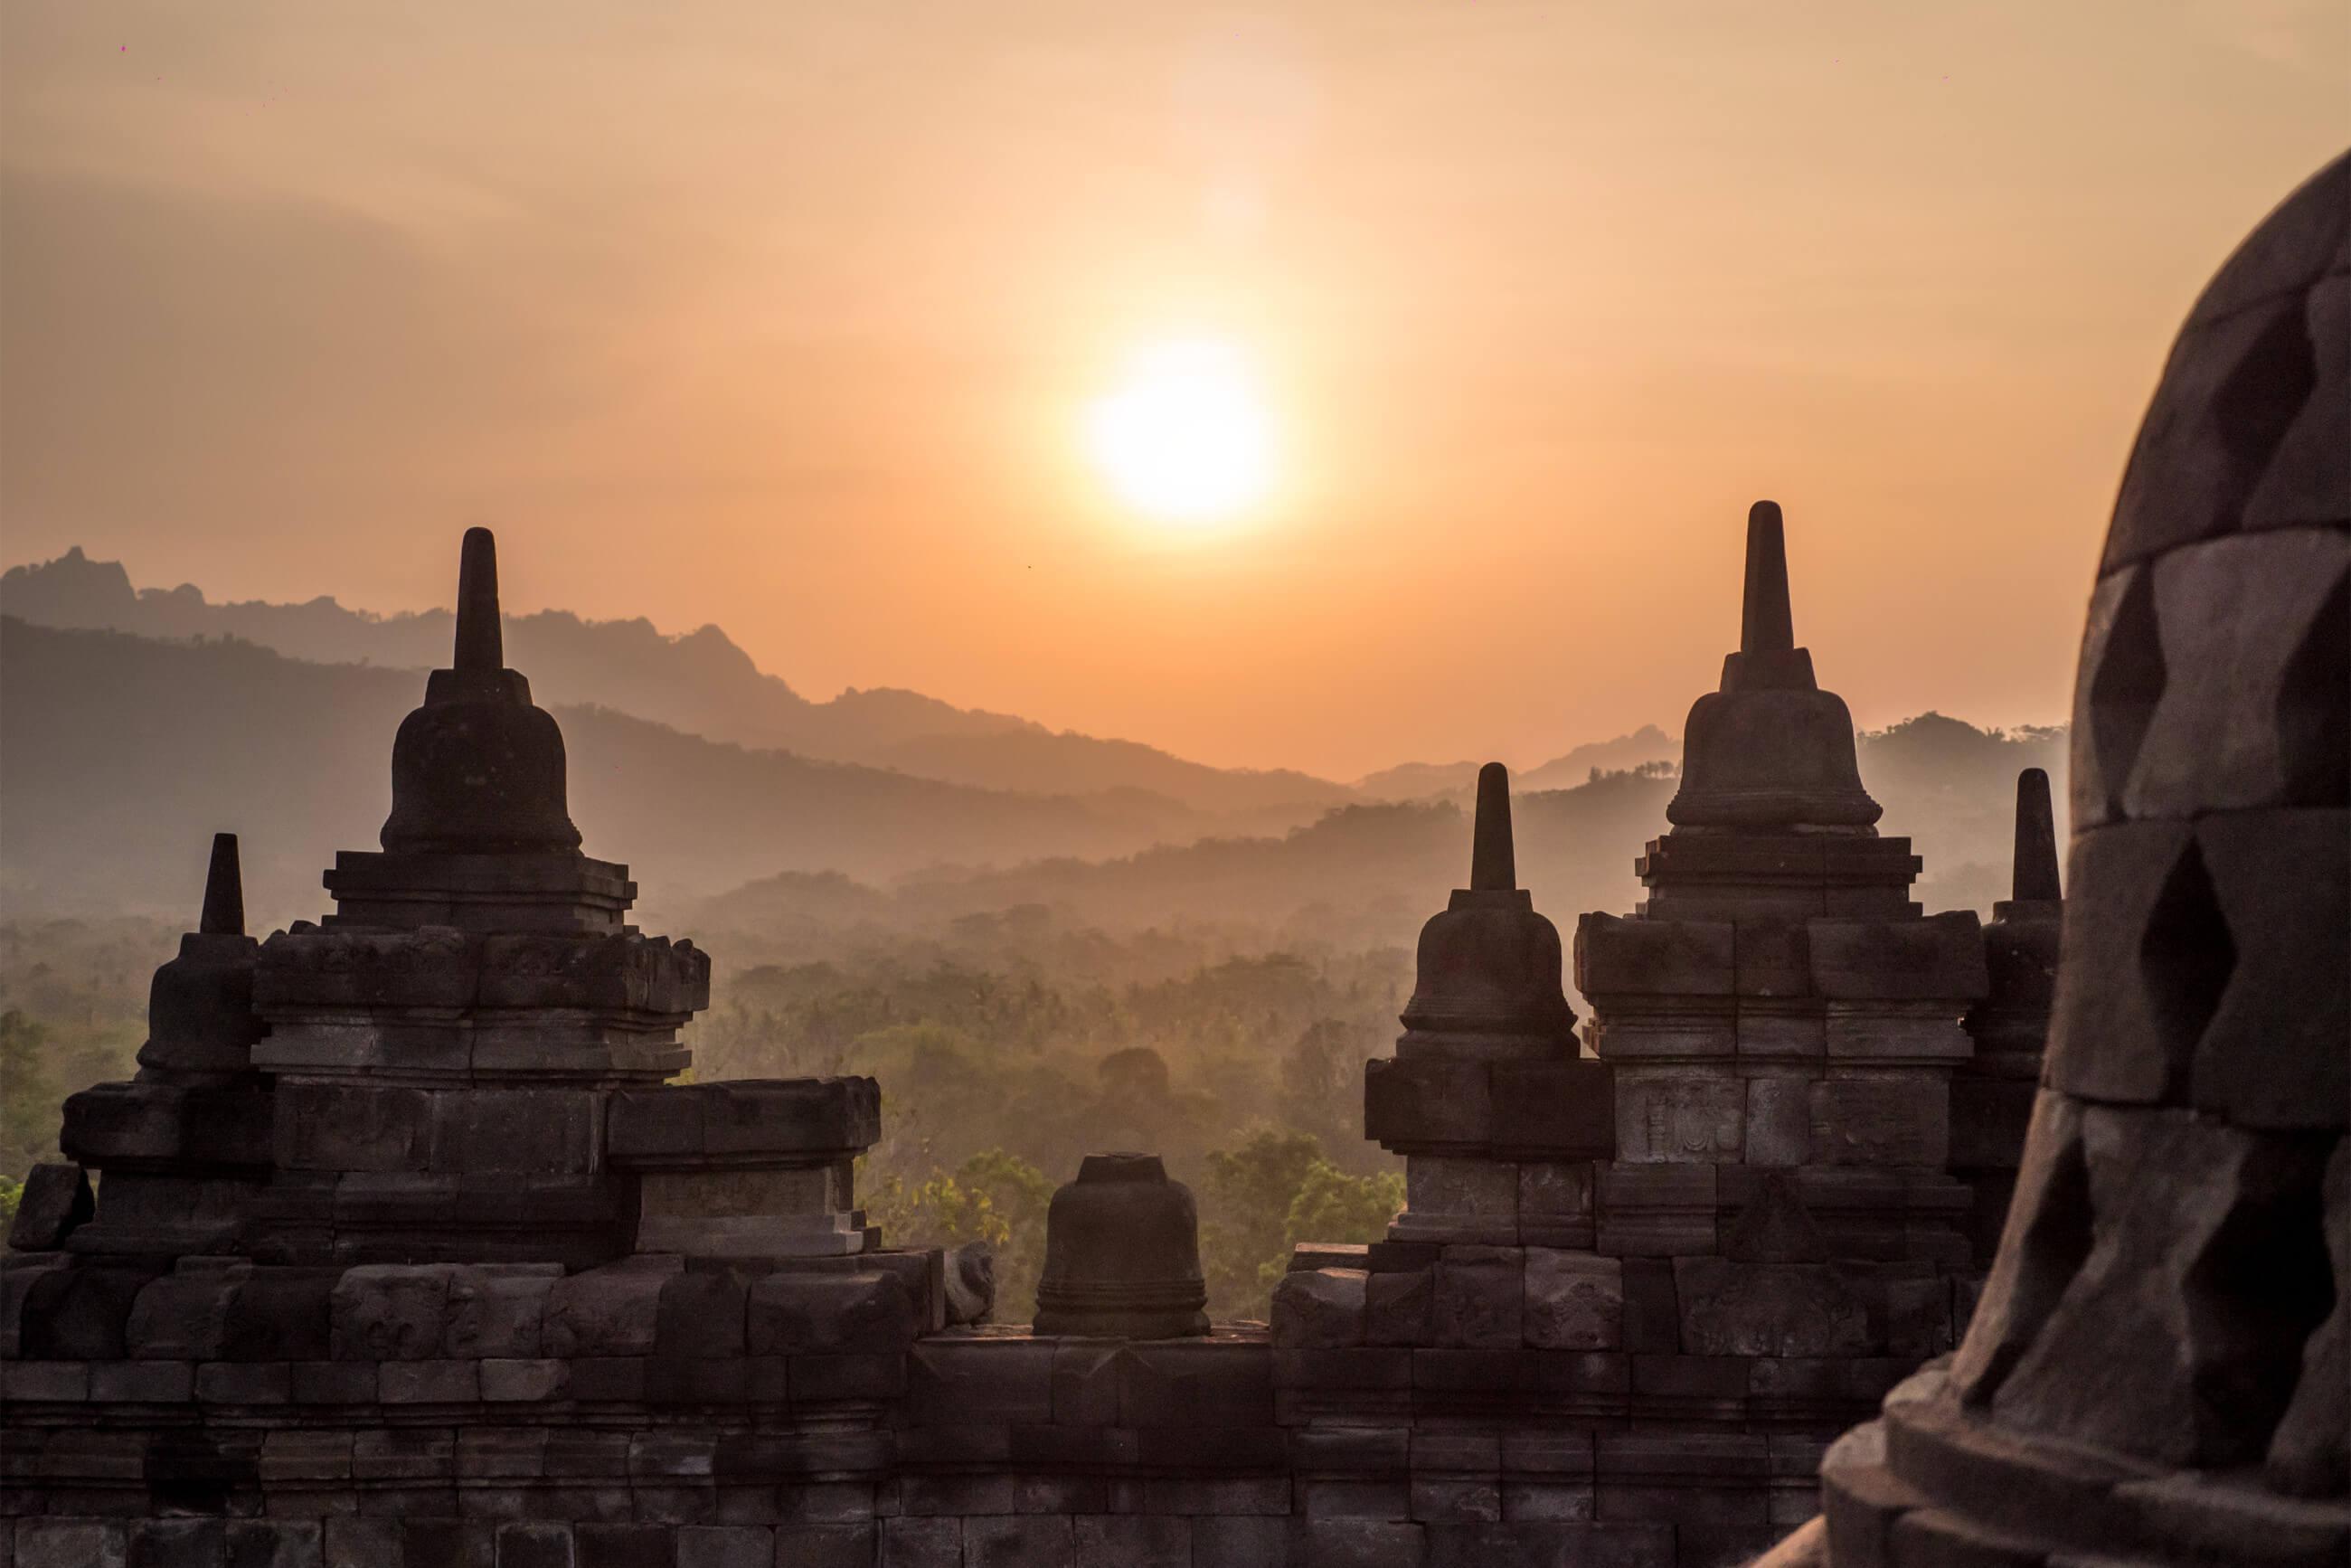 https://bubo.sk/uploads/galleries/7542/martinsimko_indonezia_borobudur.jpg